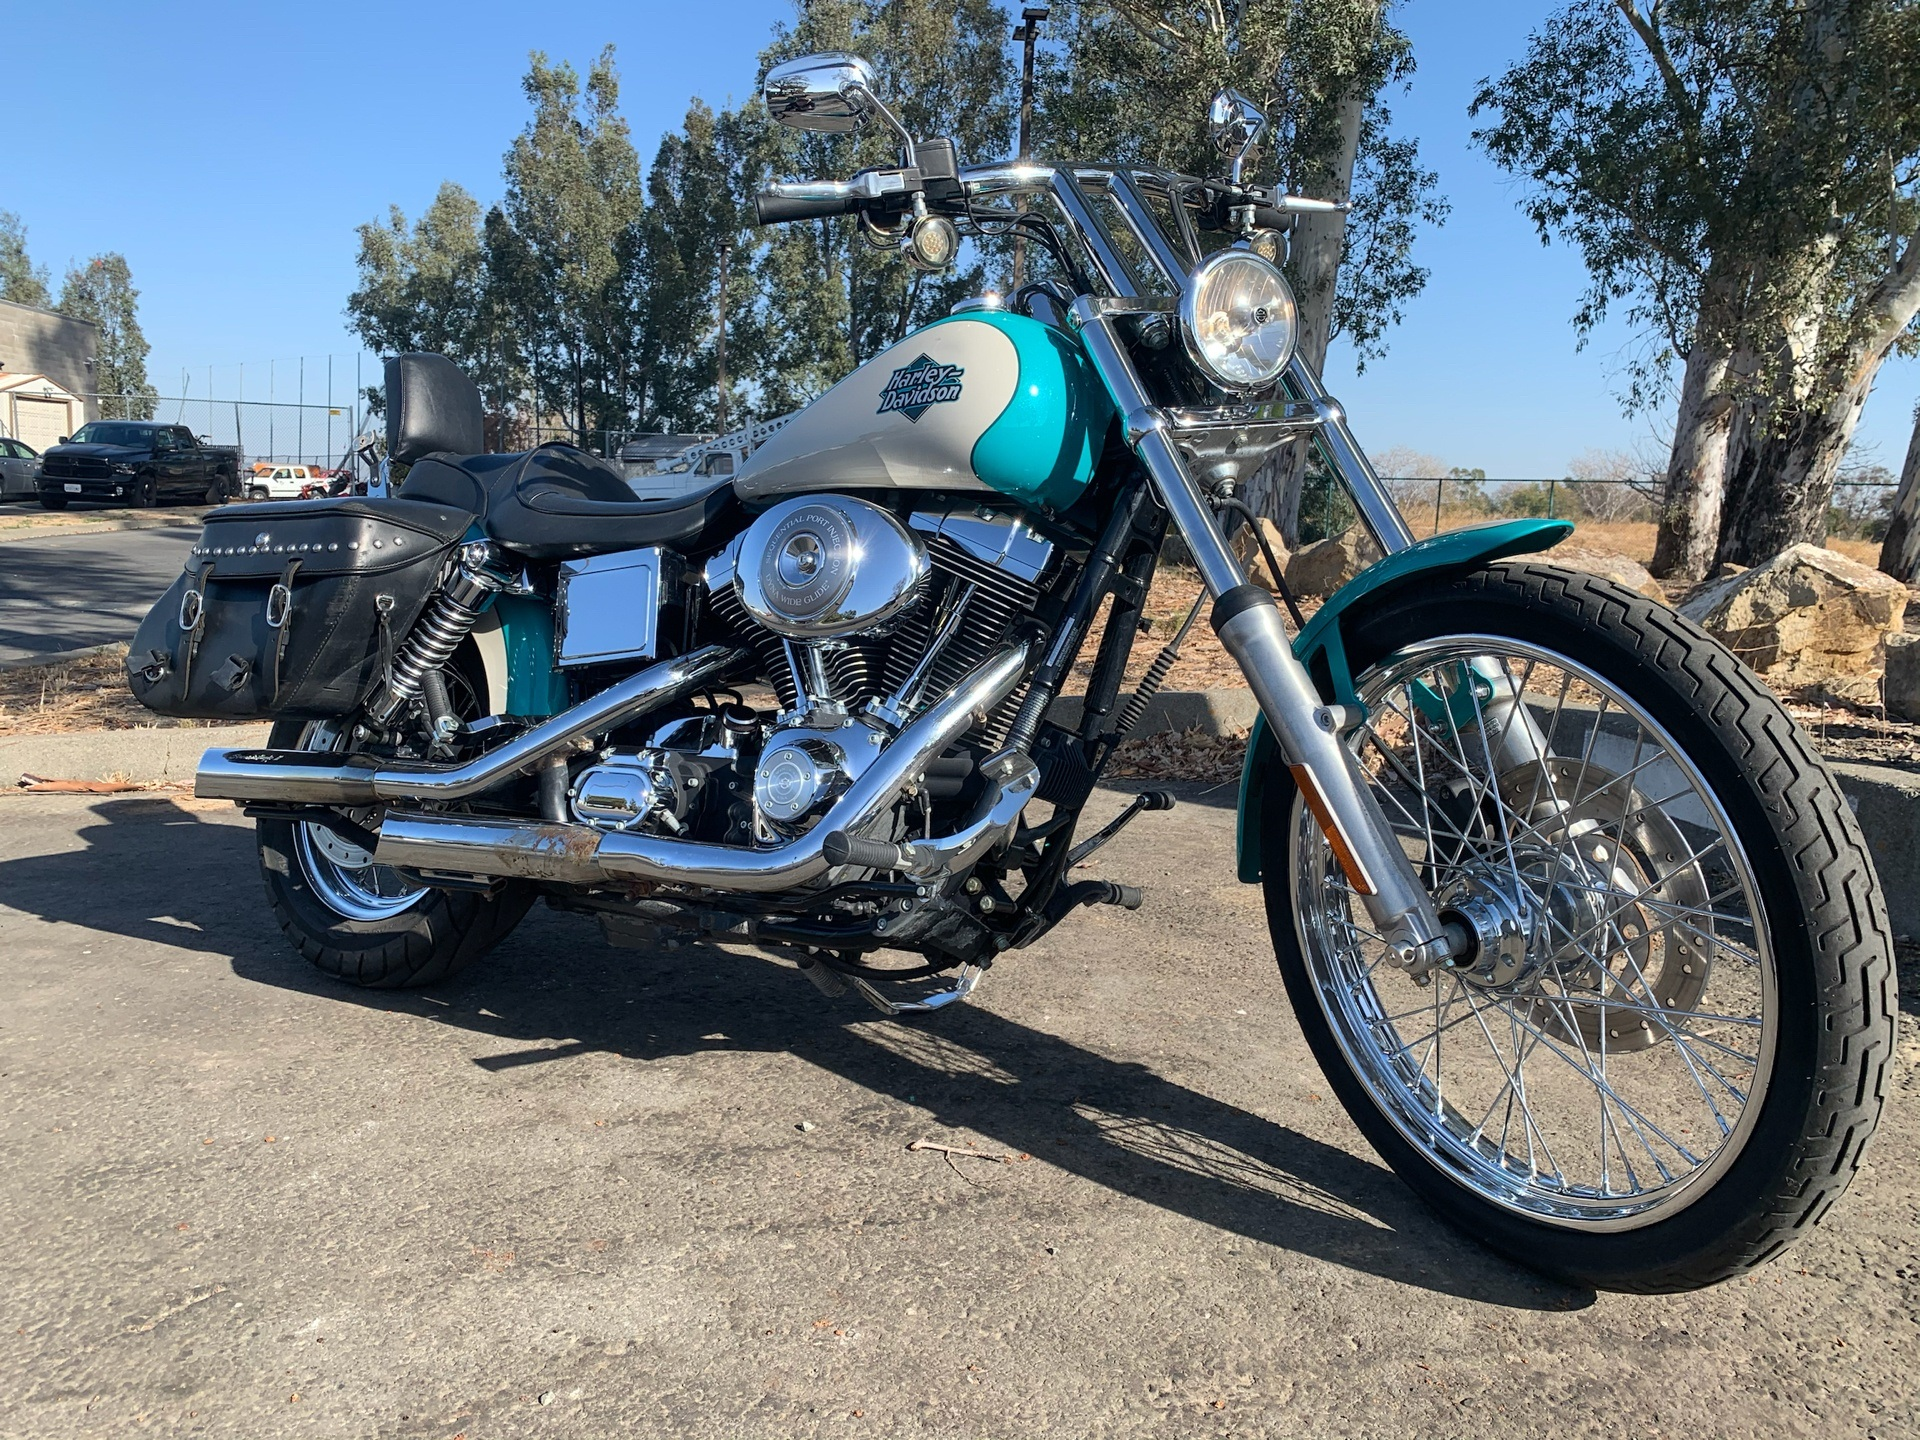 2005 Harley Davidson >> 2005 Harley Davidson Fxdwg Fxdwgi Dyna Wide Glide In Vacaville California